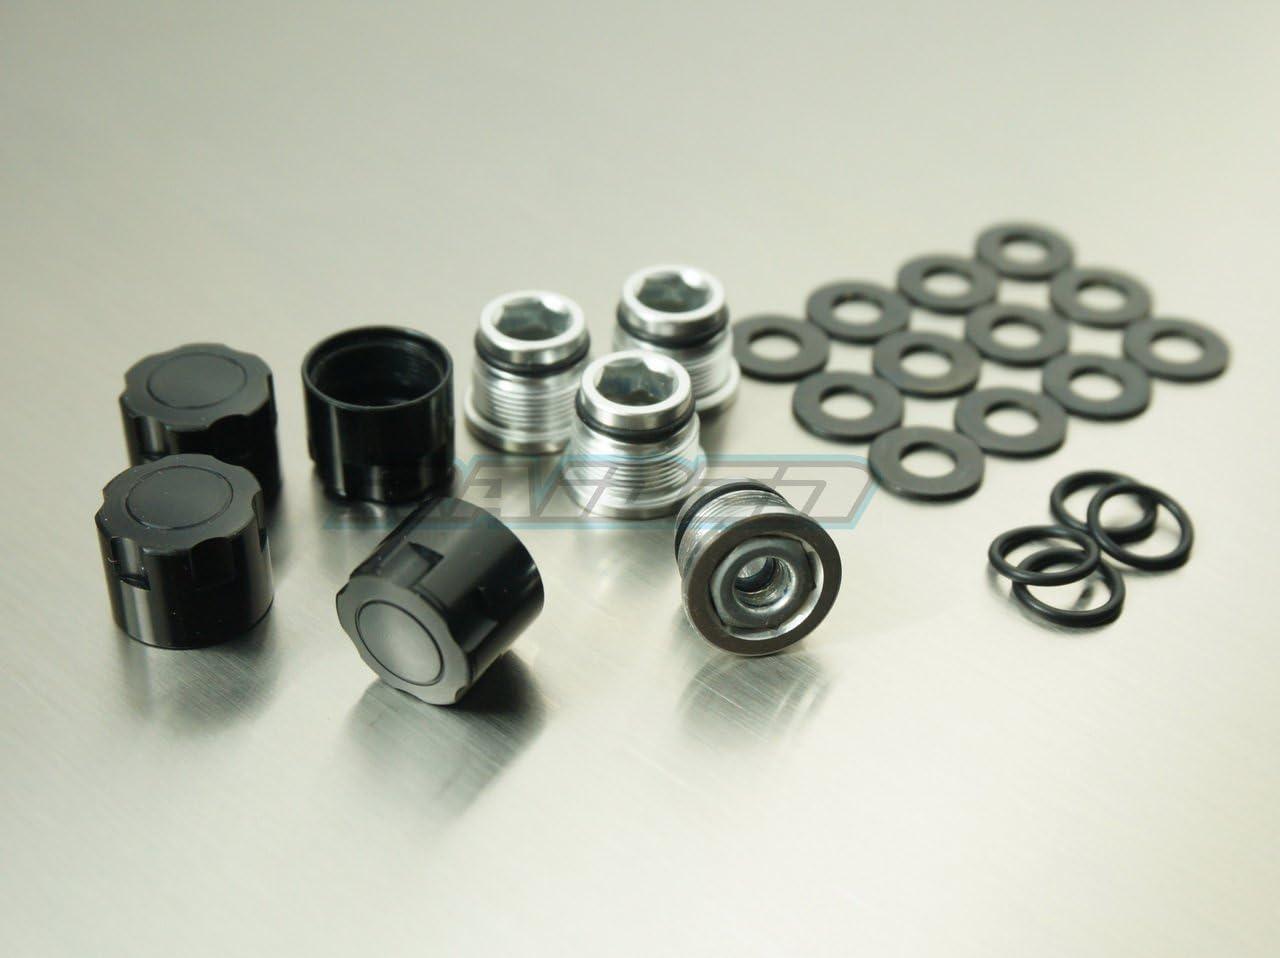 Rc Scale Center Lock Nut METAL WHEEL CAPS Lug Nut COVER 4PCS Black